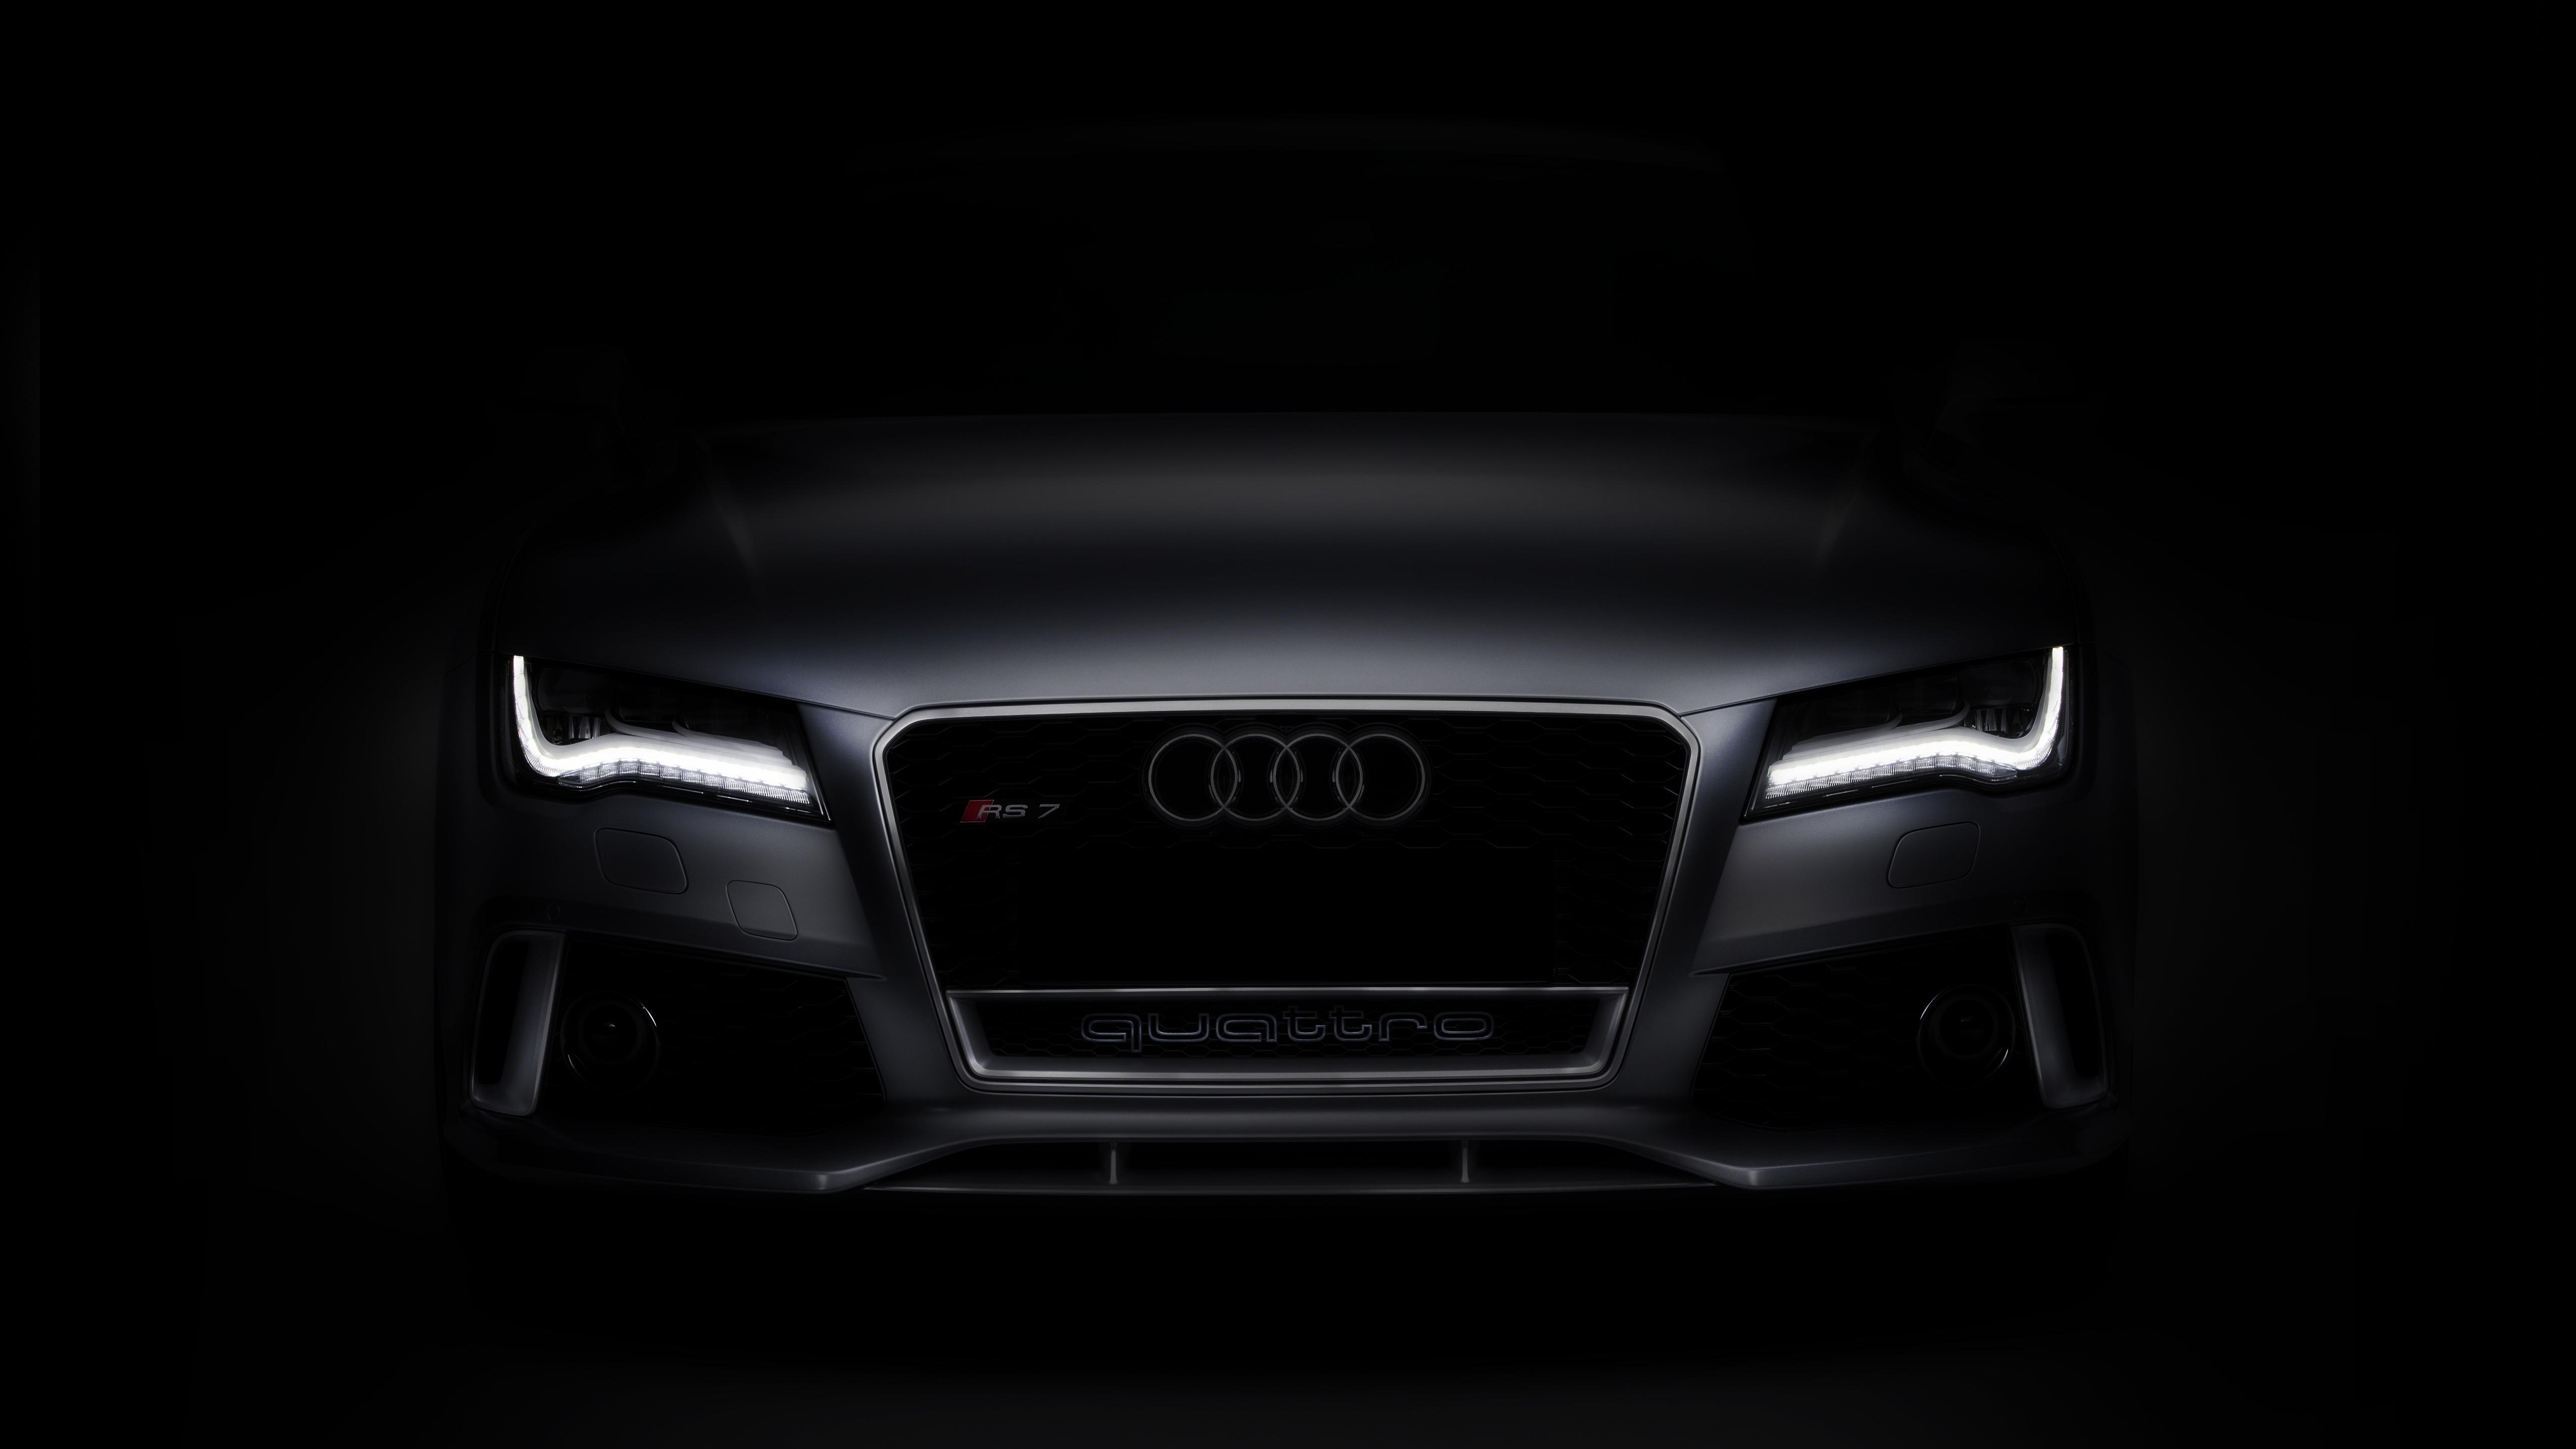 Audi Wallpaper 10 5120x2880